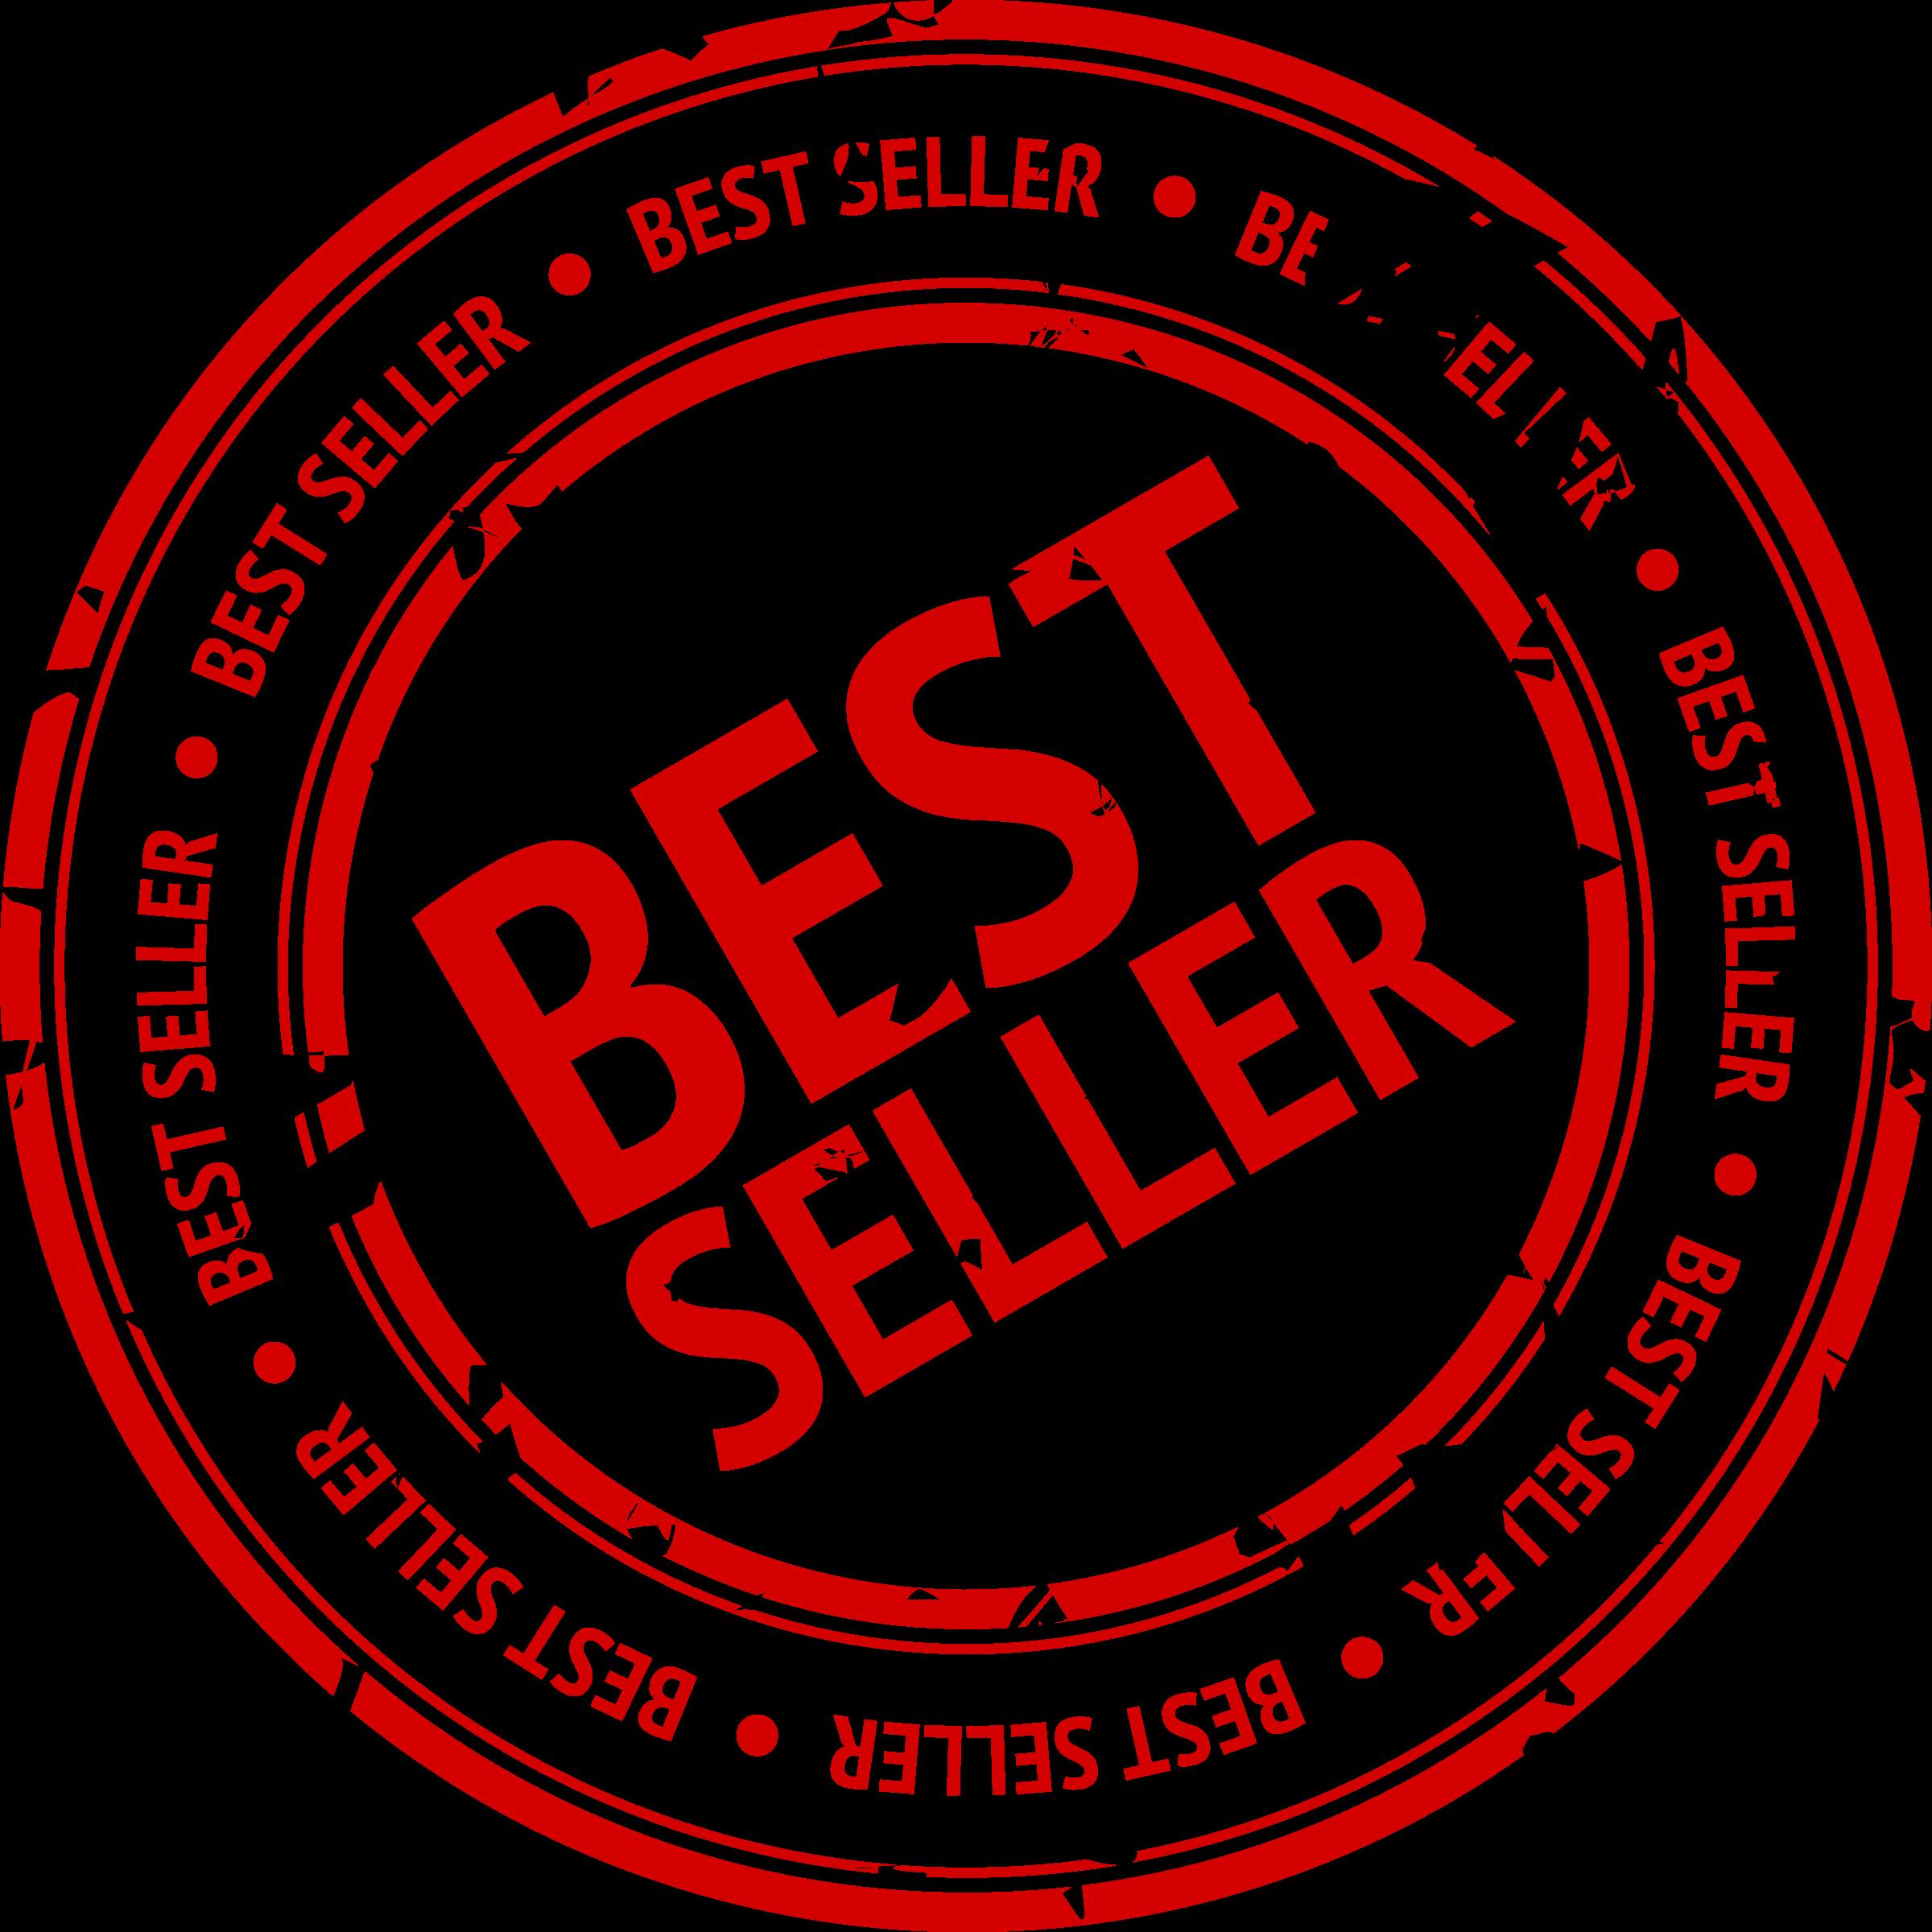 Free Best Seller Stamp Png image #24402 - Stamp PNG